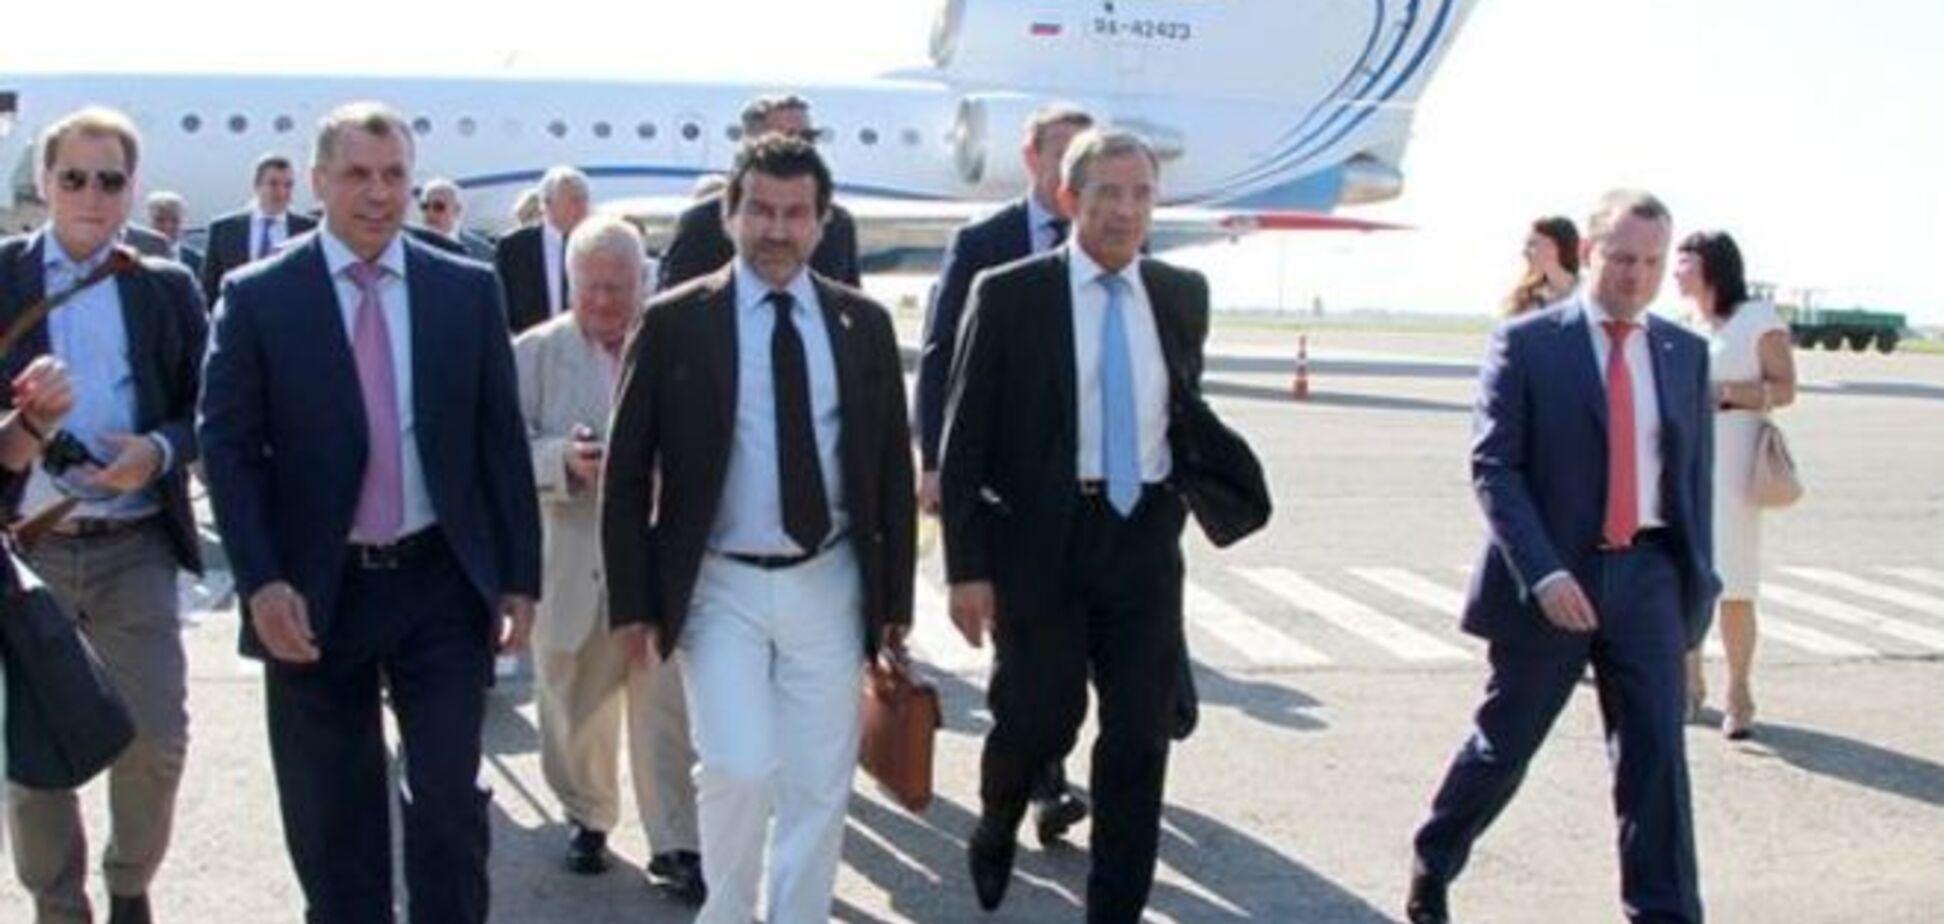 Французские 'друзья Путина' таки добрались до Крыма: фотофакт